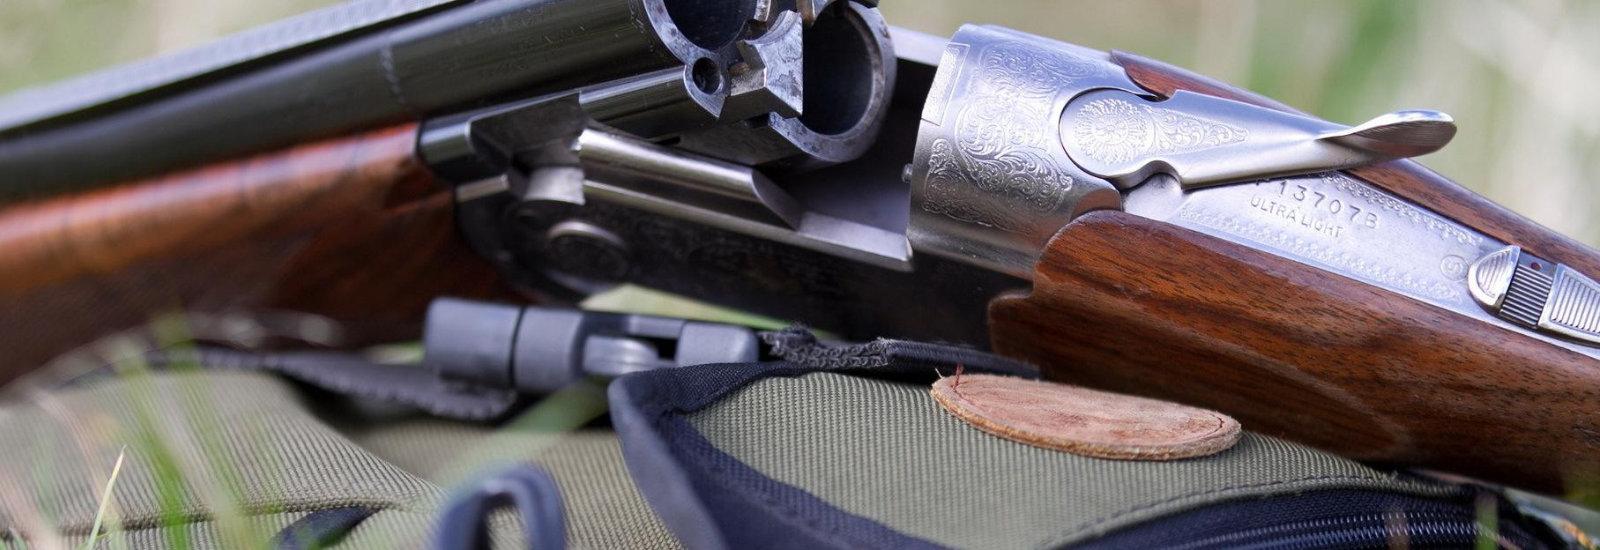 Оценка оружия 1200 рублей за 30 минут, оценка оружия для наследства, (495) 766 06 78